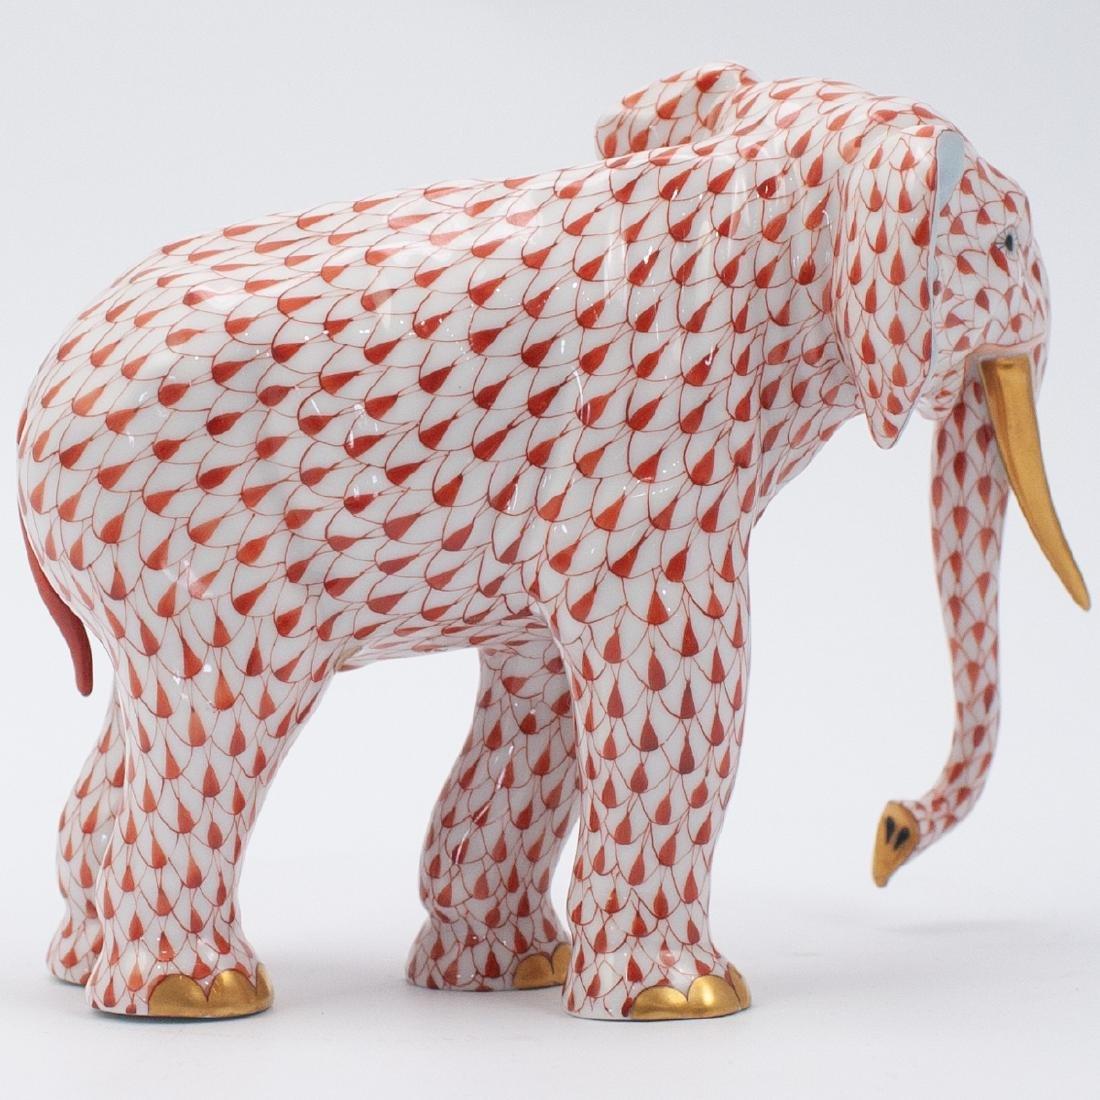 Herend Porcelain Fishnet Elephant - 2